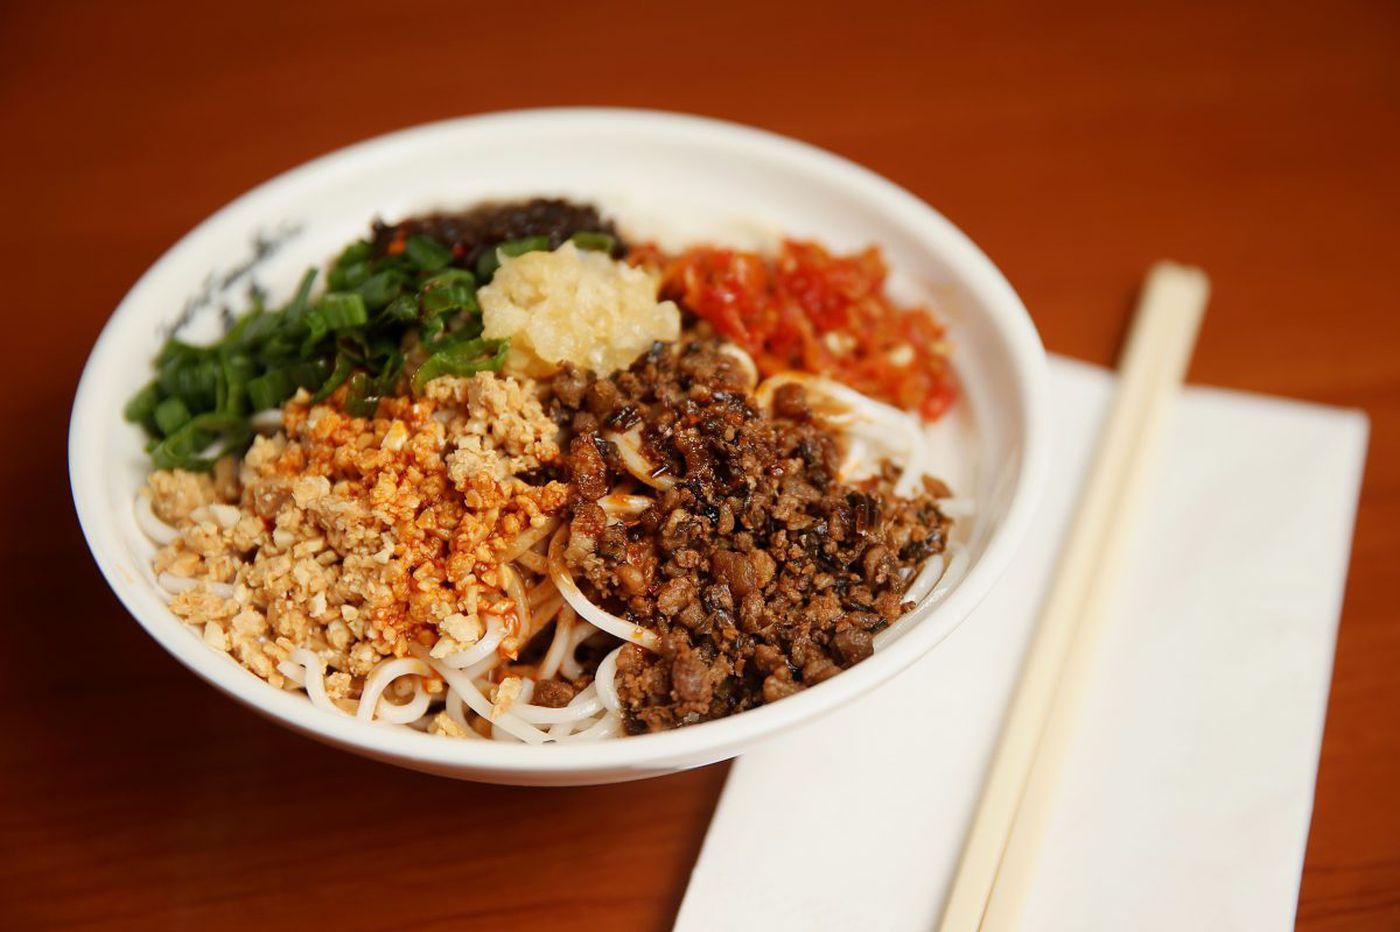 Hip new Sichuan kitchen part of an emerging Chinatown West